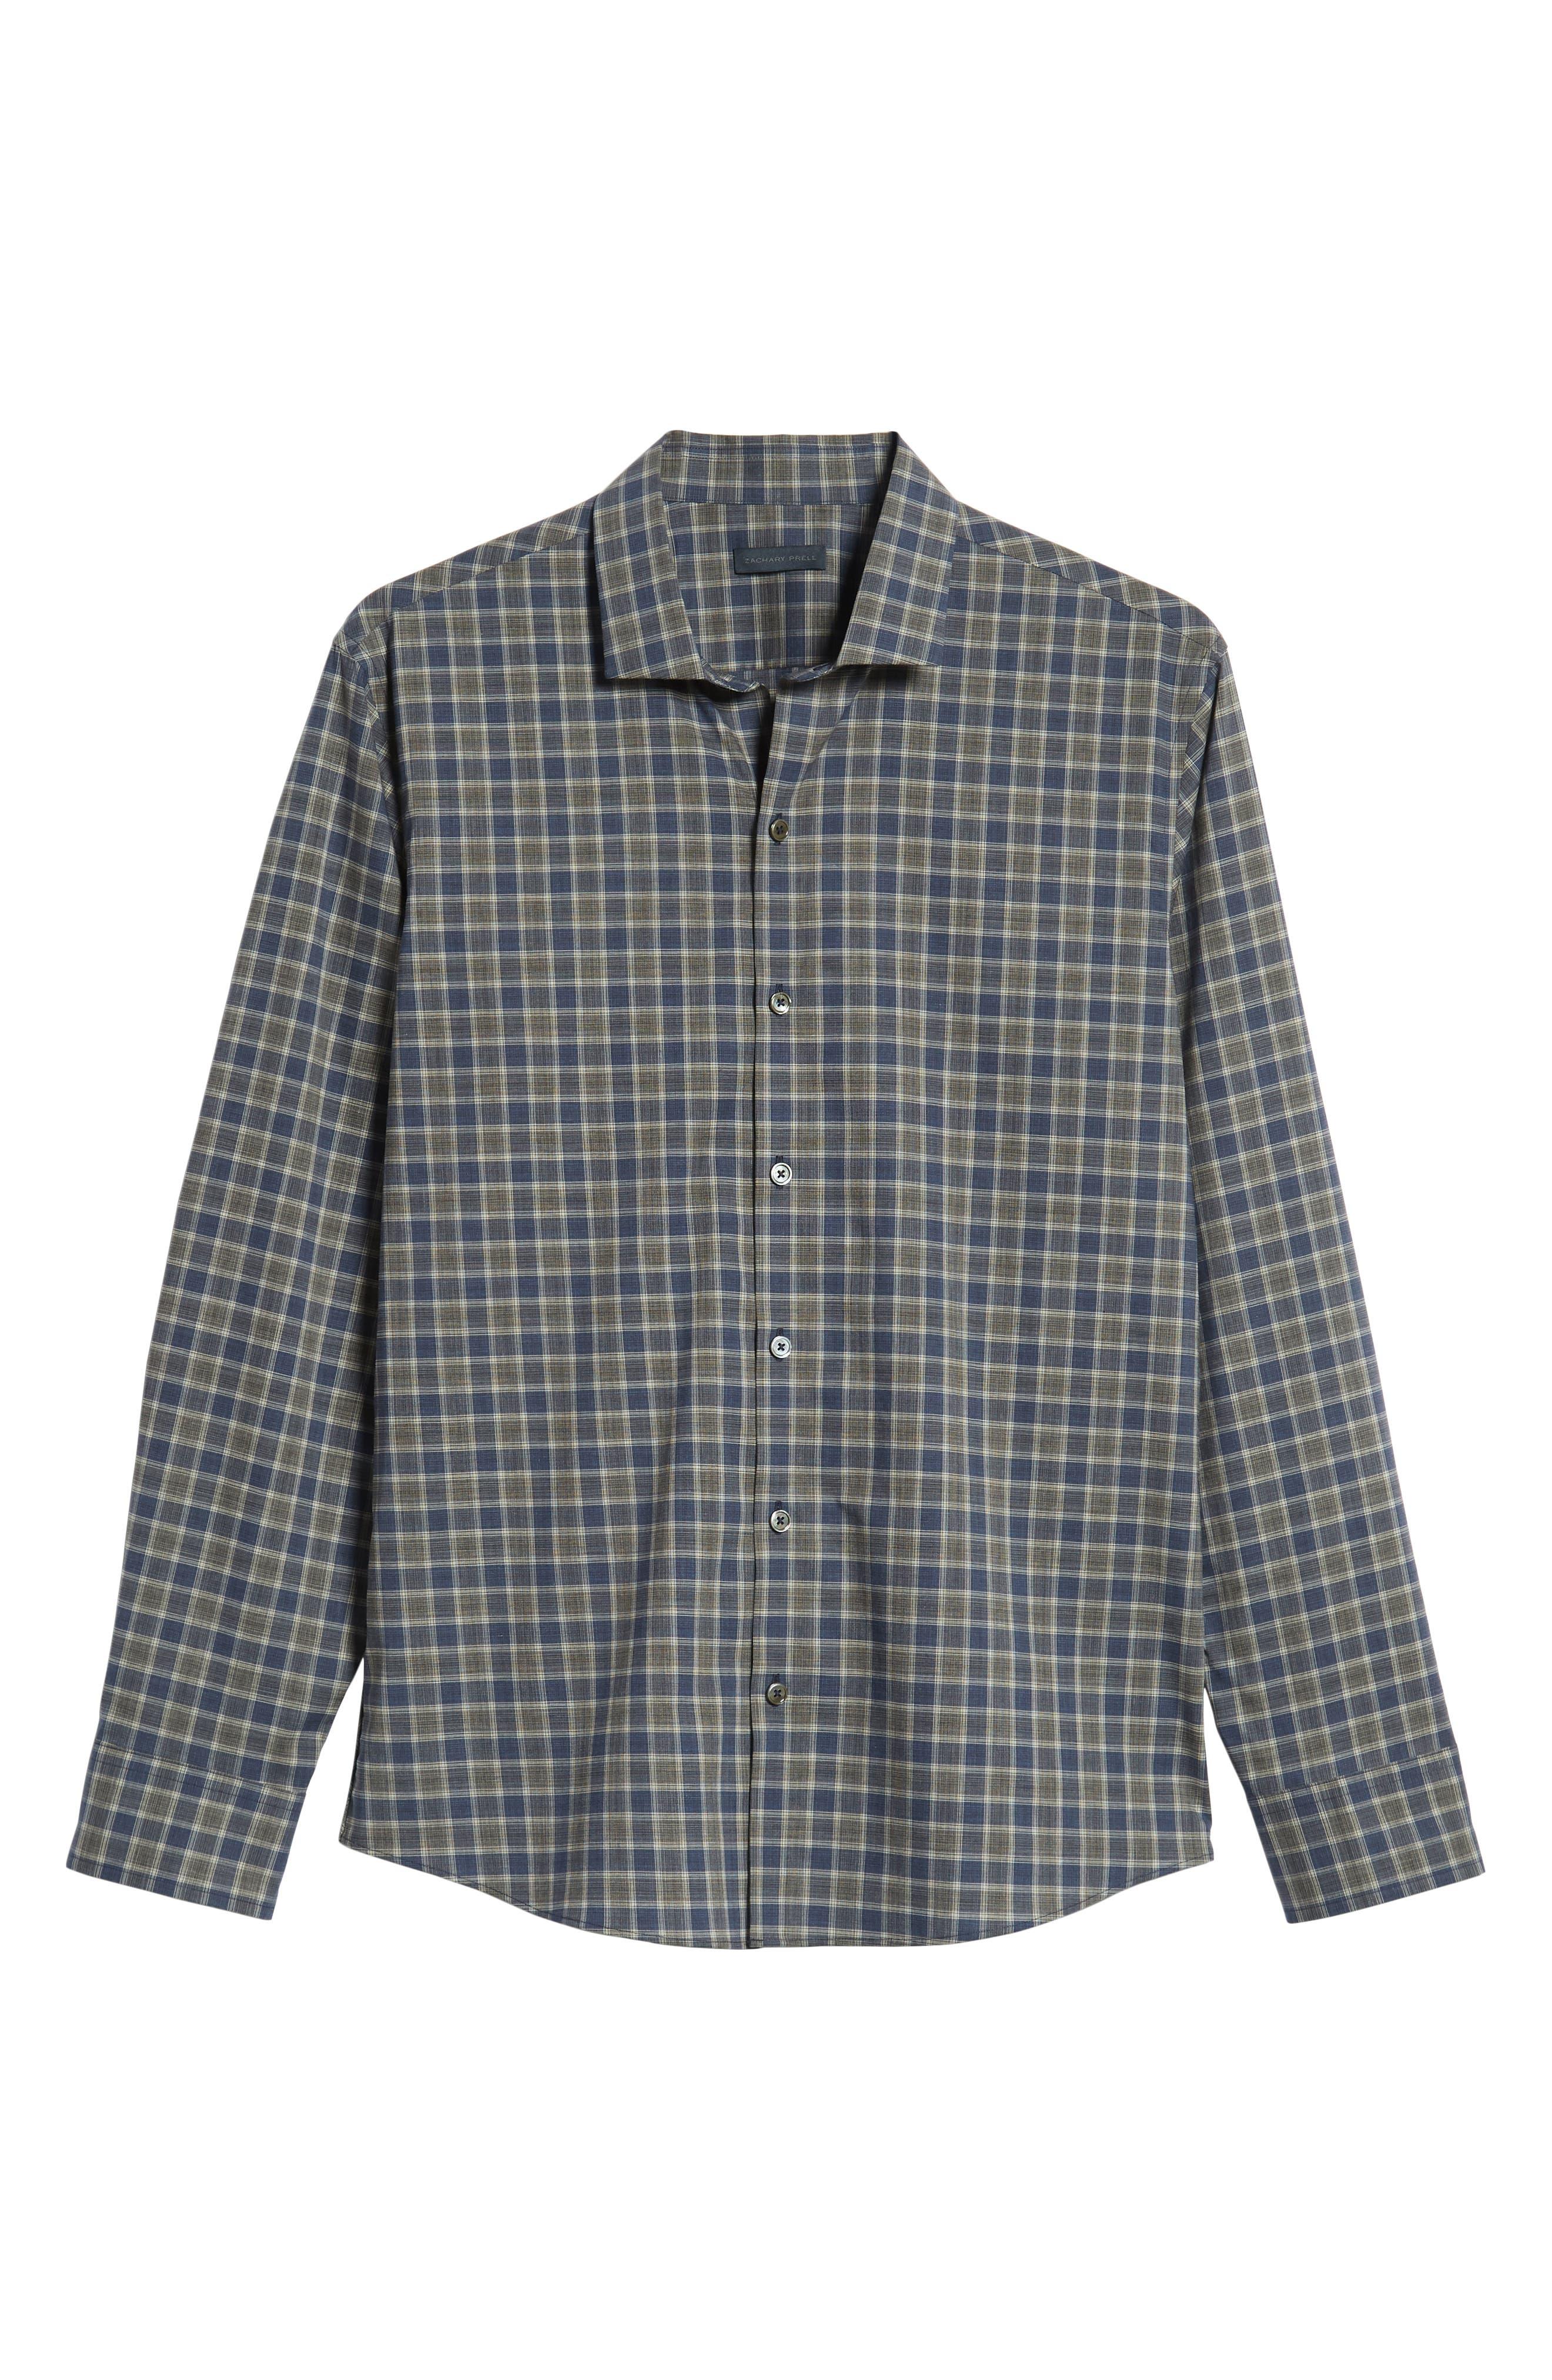 ZACHARY PRELL,                             Giunta Regular Fit Check Sport Shirt,                             Alternate thumbnail 5, color,                             BLUE